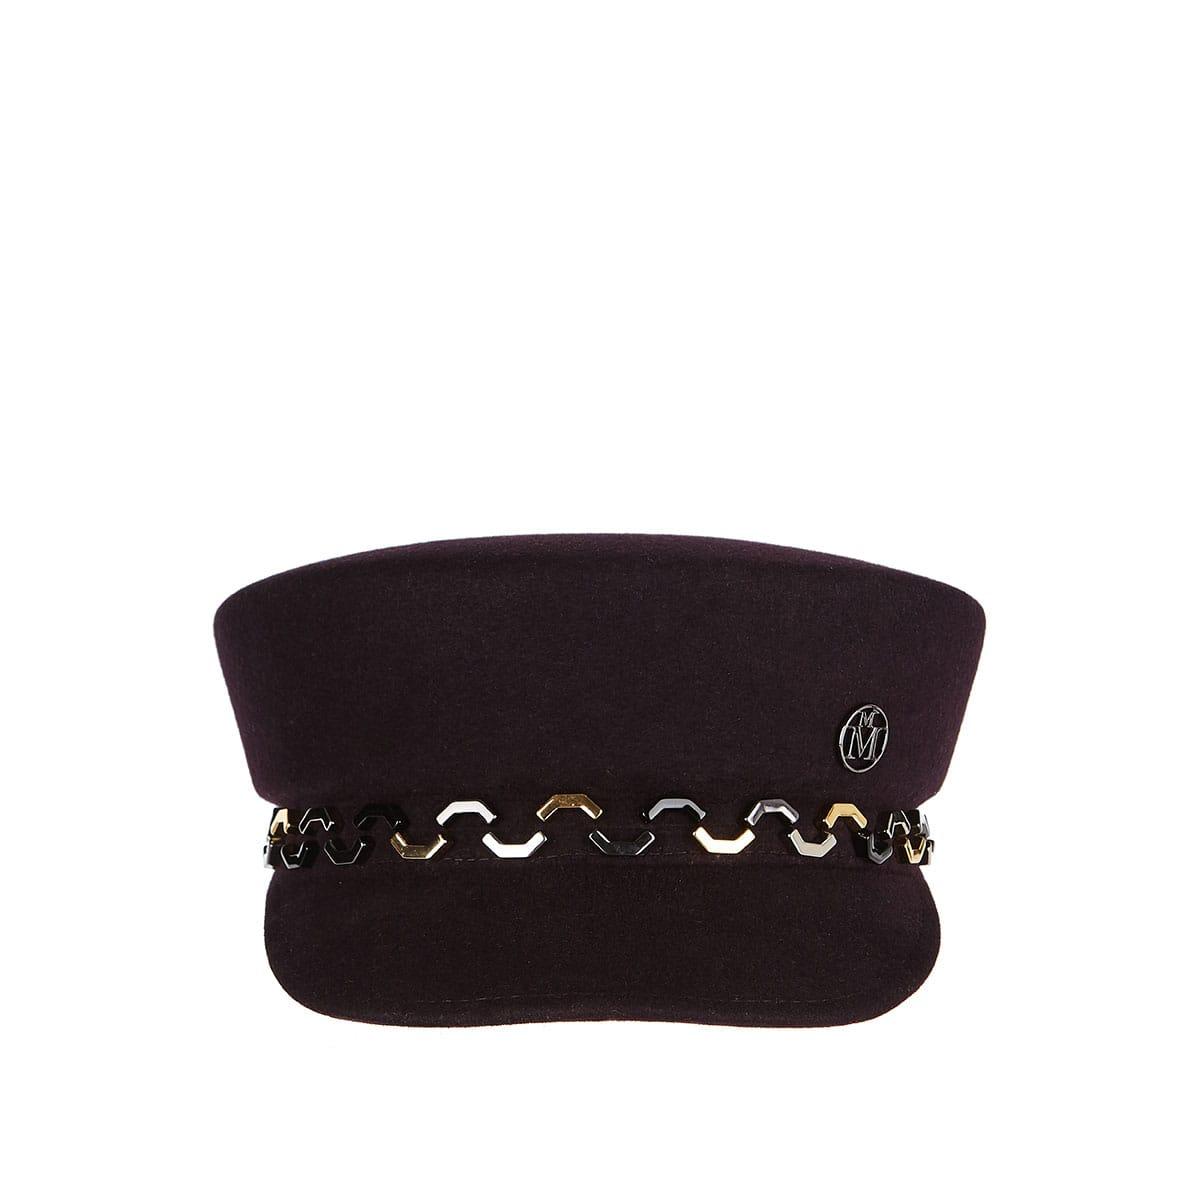 Abby wool sailor cap